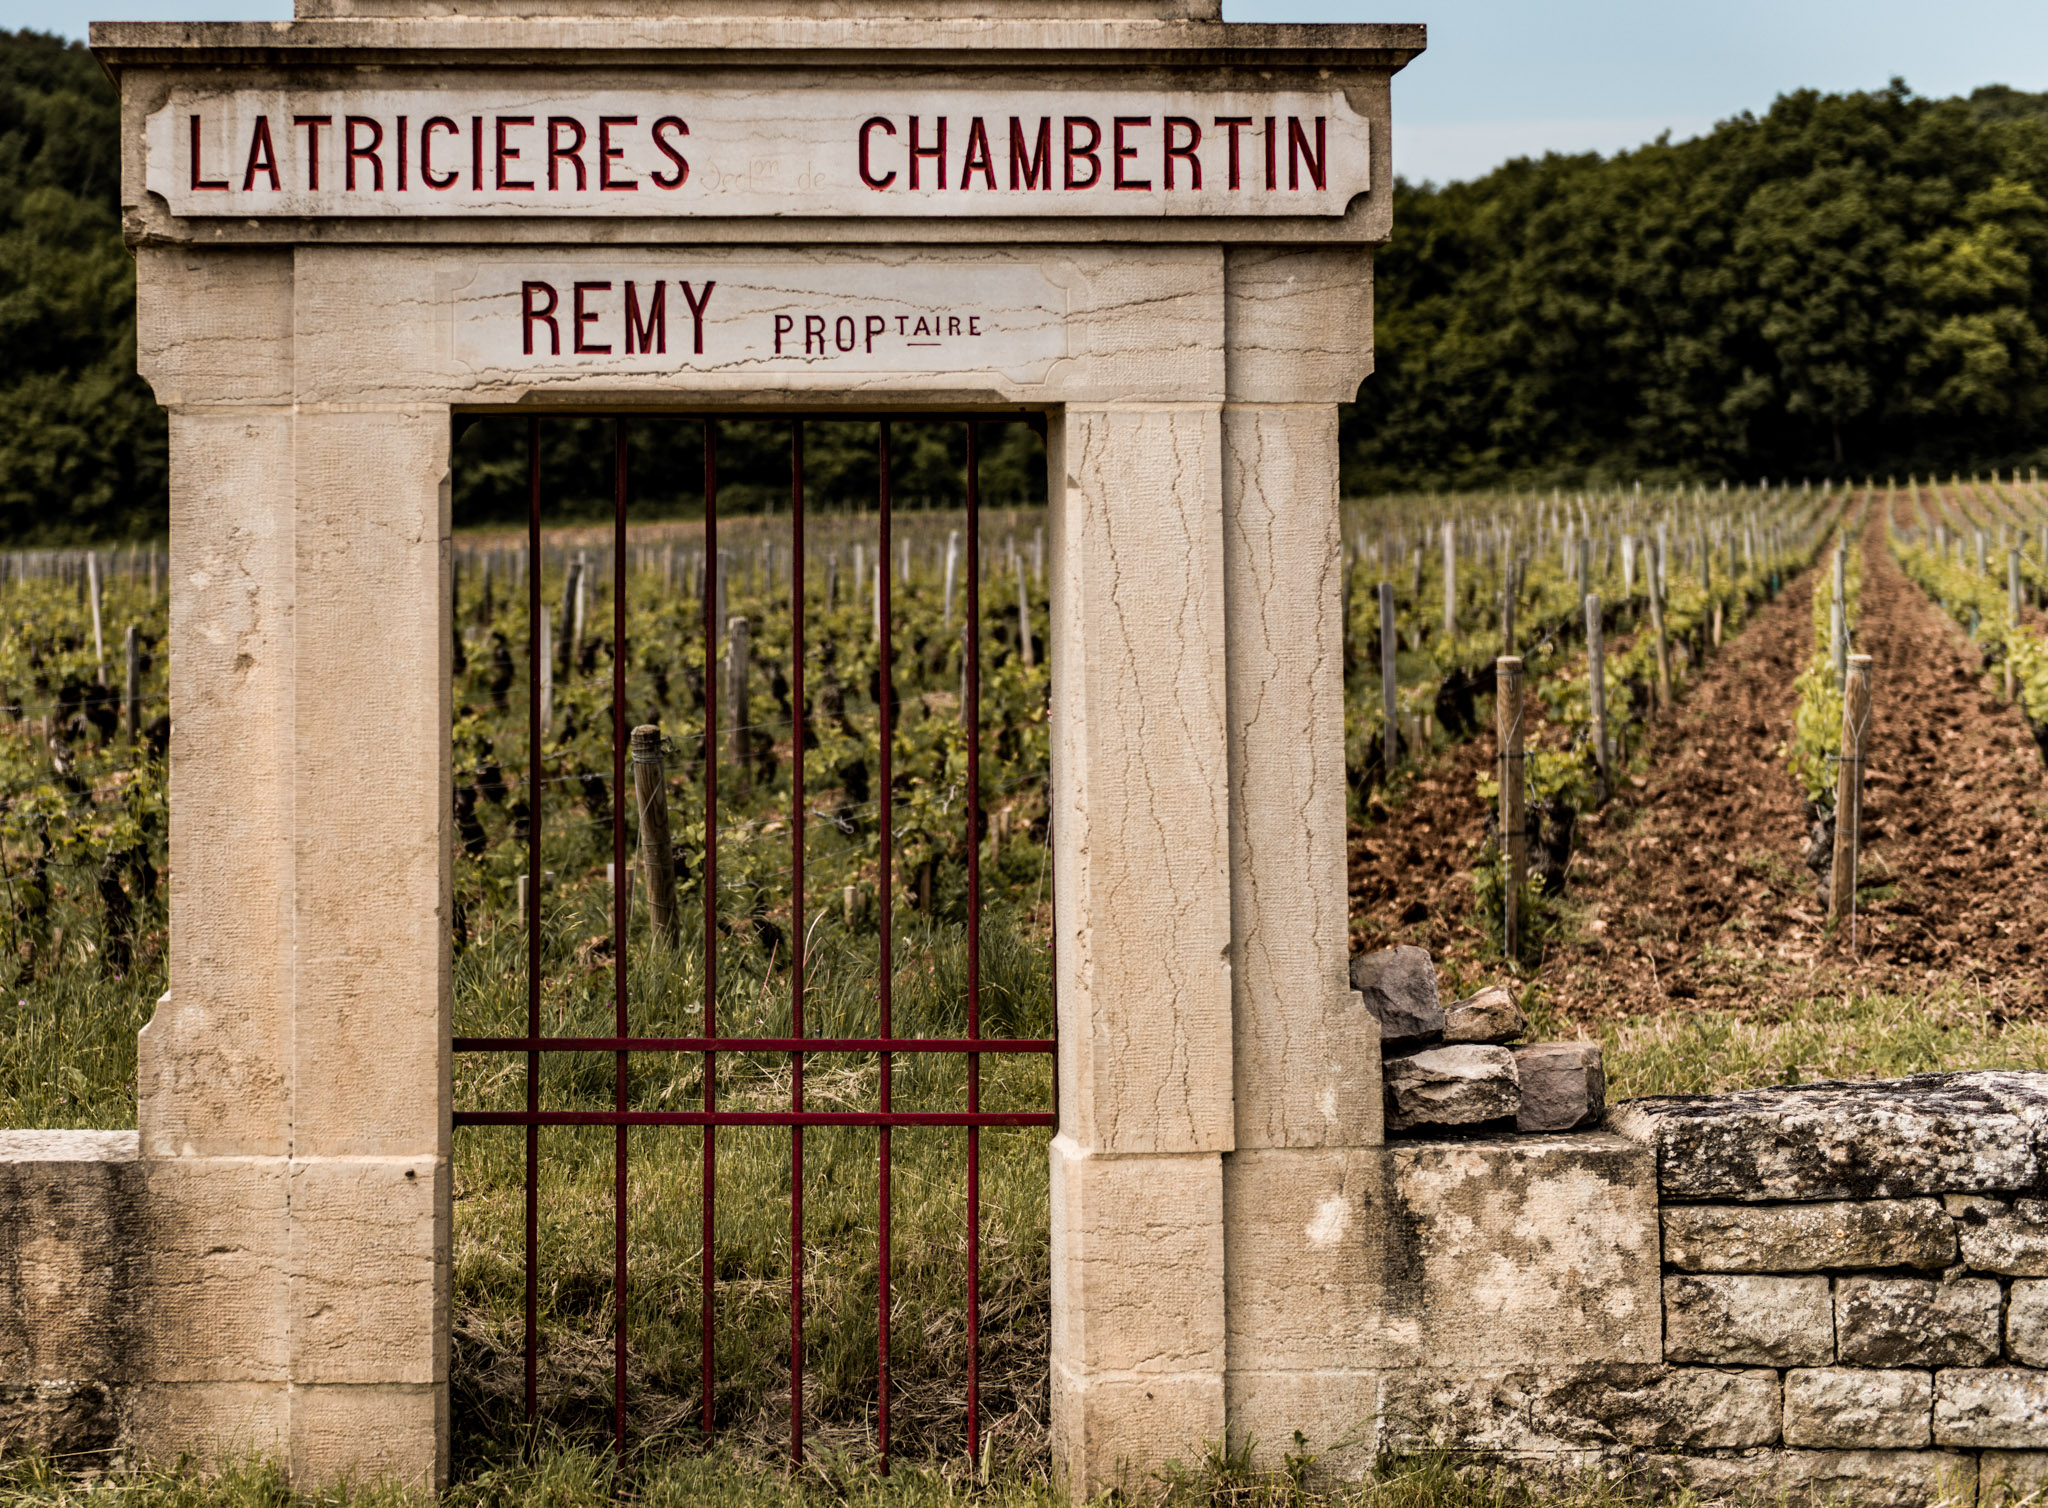 Burgundy : Cote de Nuits : Gevrey-Chambertin : Latricieres Chambertin